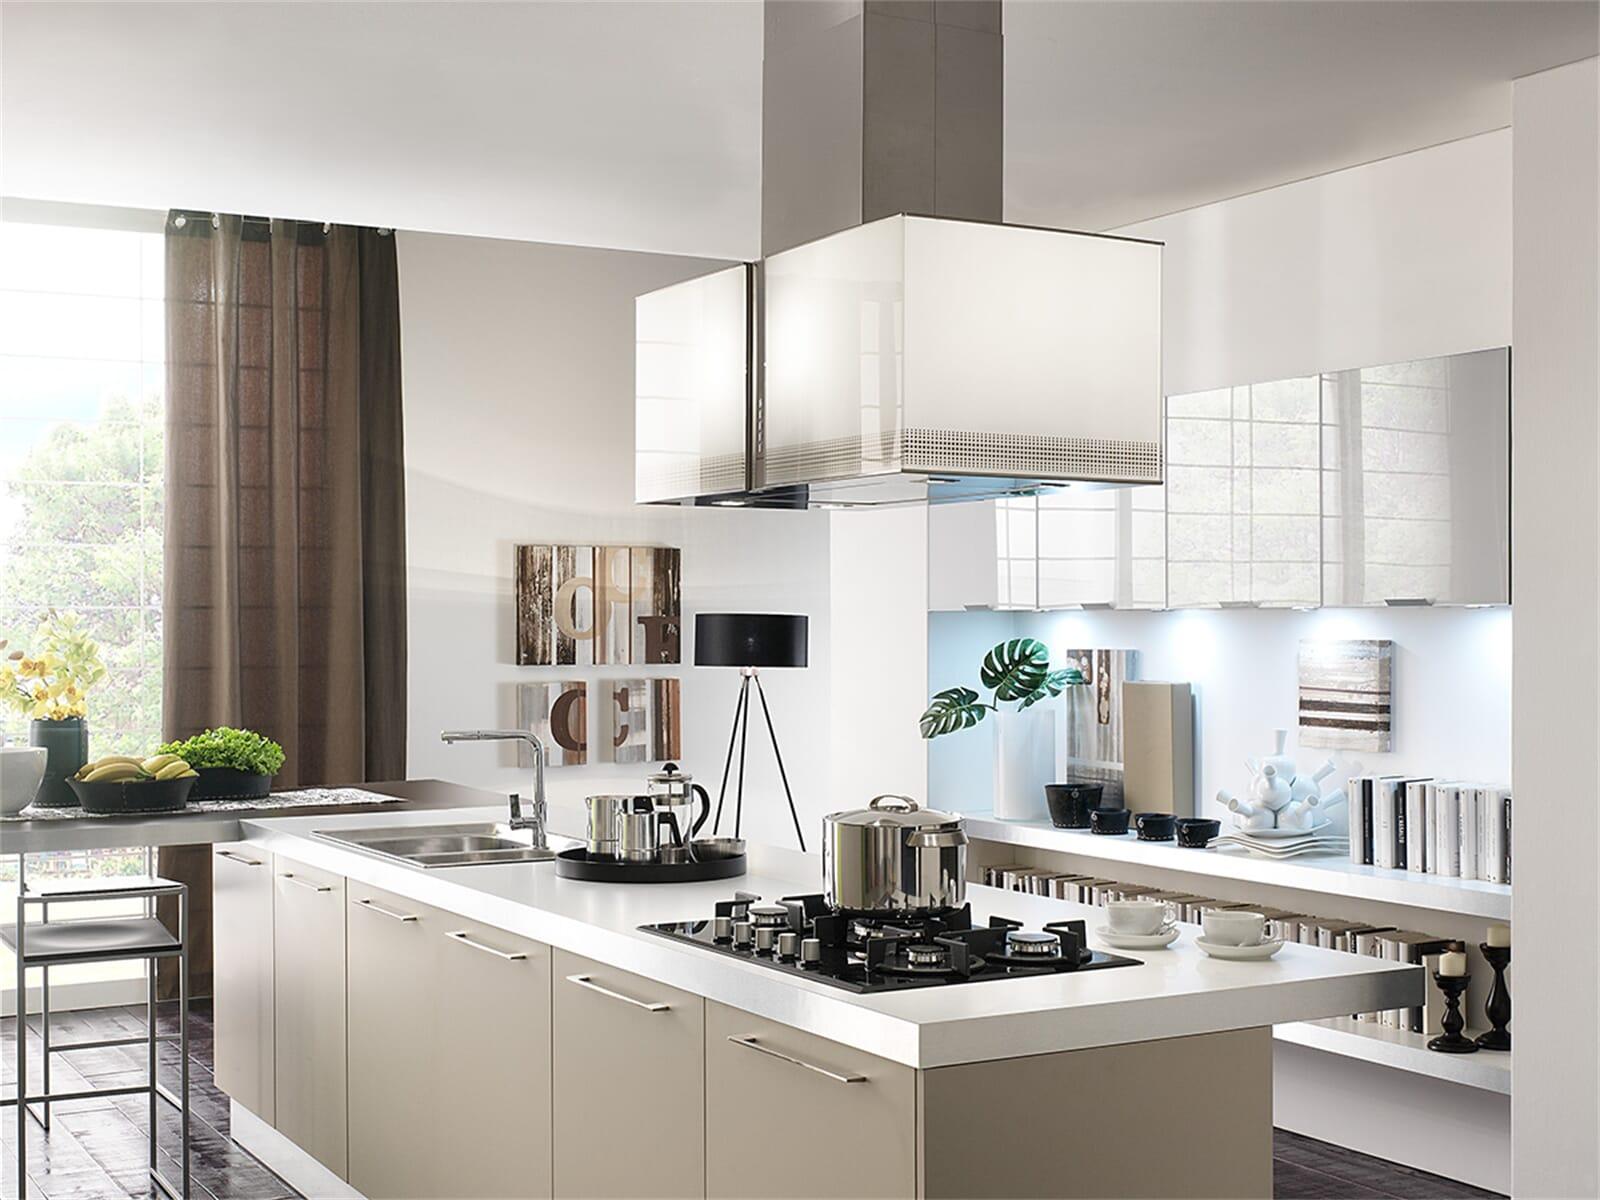 falmec mirabilia platinum insel dunstabzugshaube edelstahl. Black Bedroom Furniture Sets. Home Design Ideas